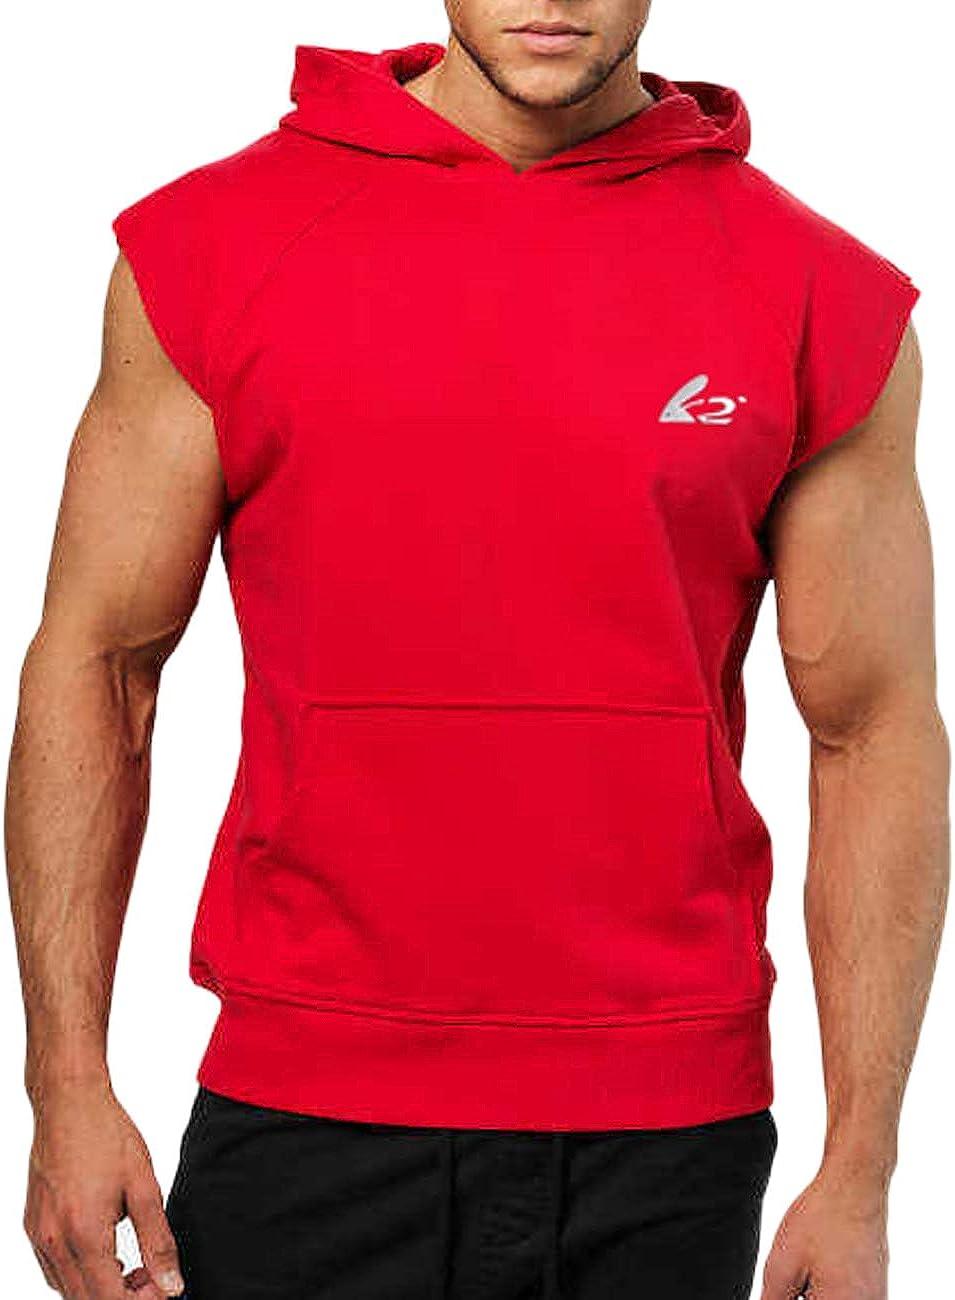 PAIZH Men's Bodybuilding Sleeveless Hoodies Gym Workout Hooded Tank Tops